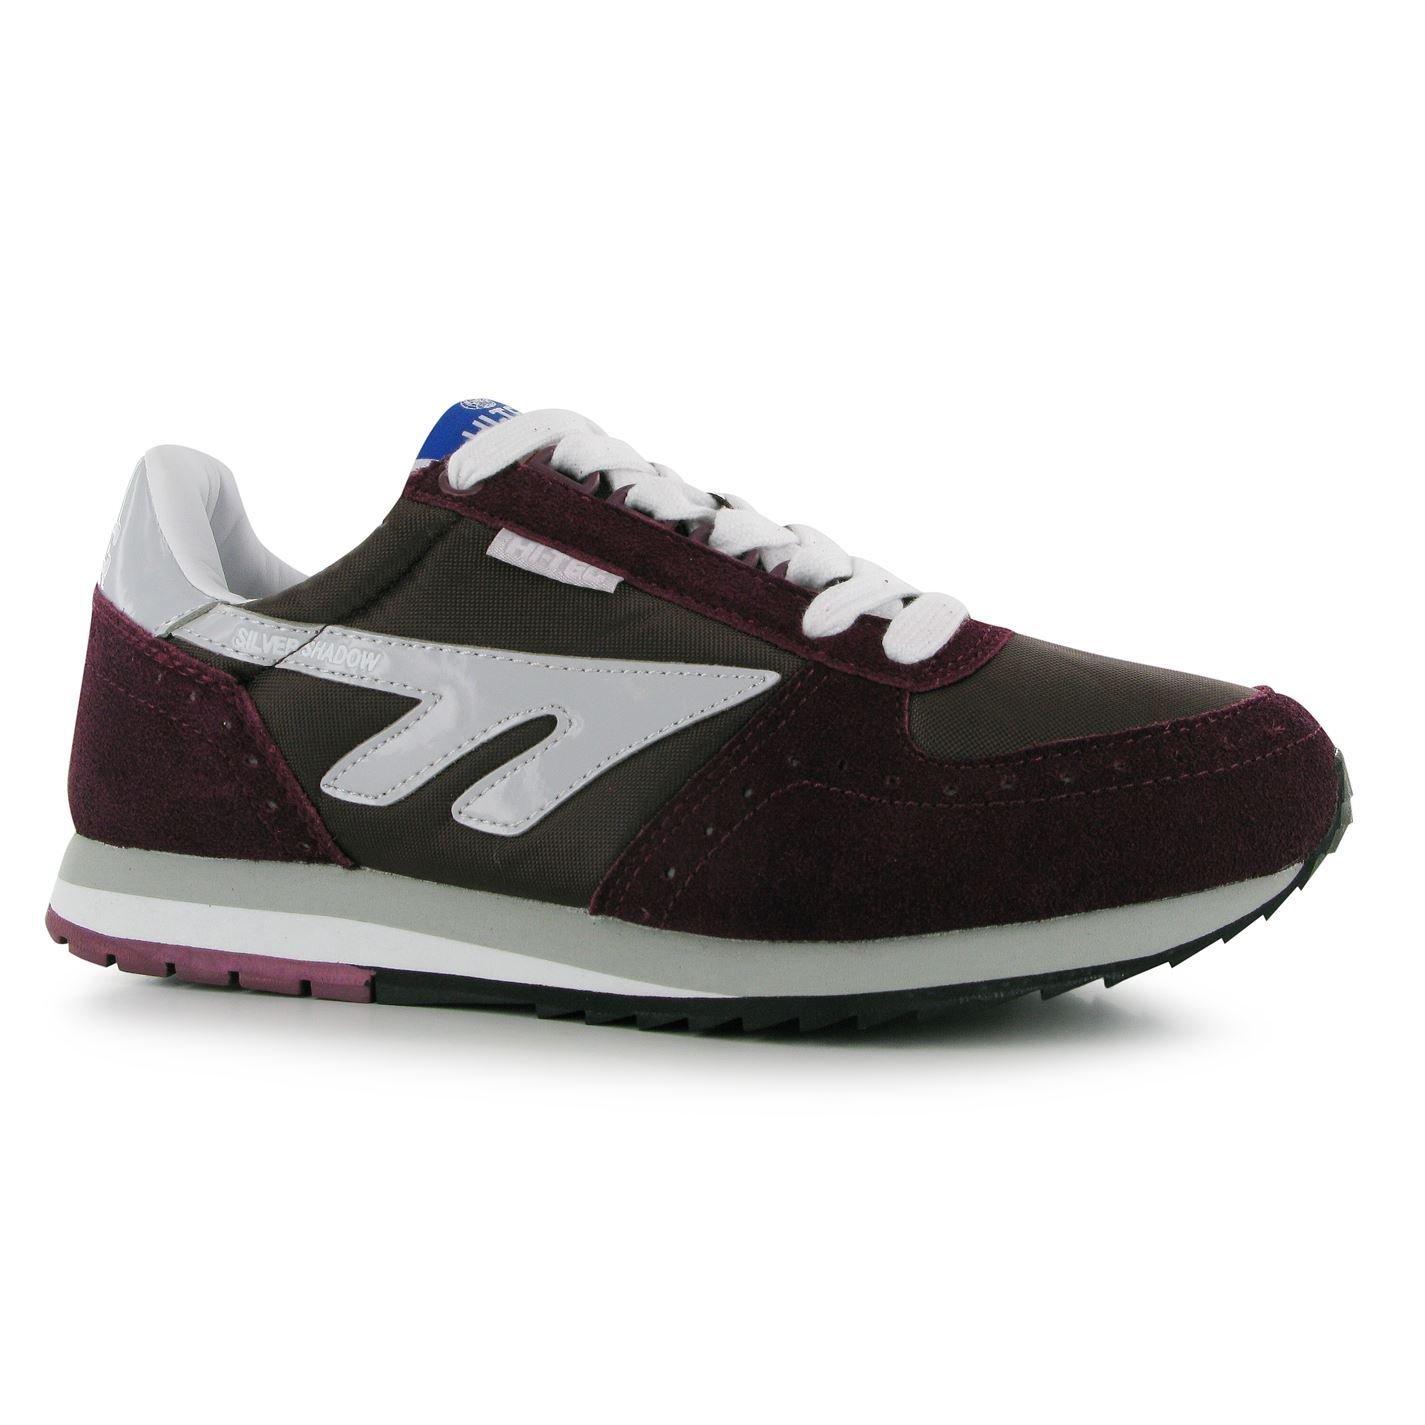 bb976b3018d Hi-Tec Silver Shadow Trainers Mens Burgundy/White Sports Shoes ...